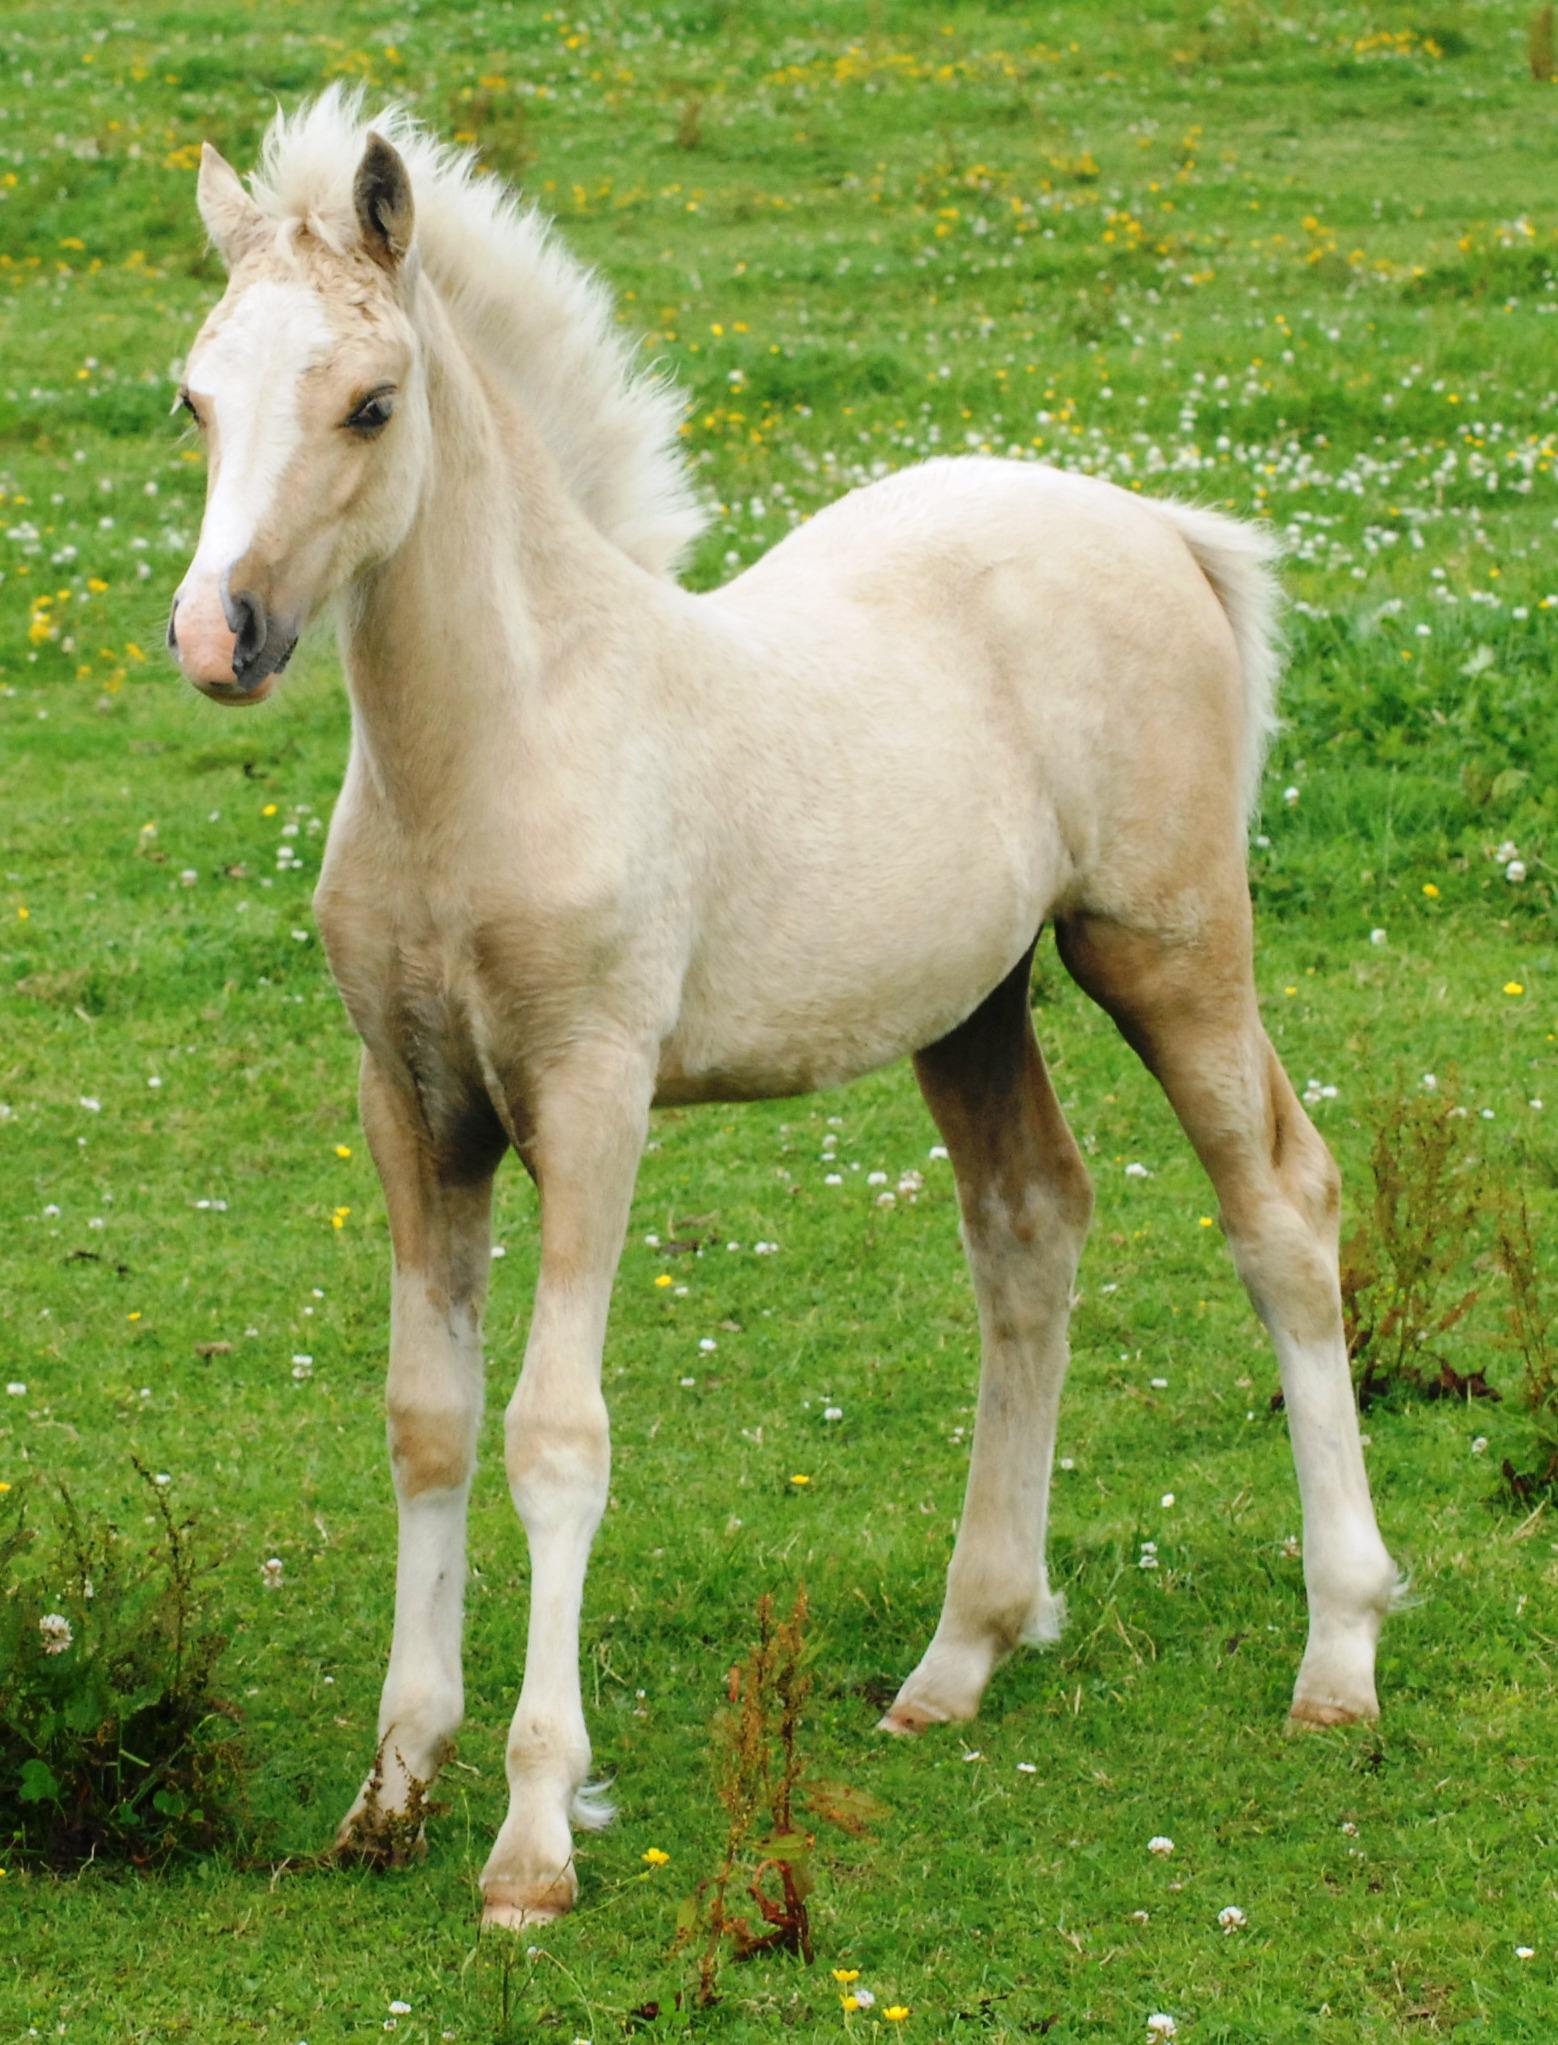 foals - photo #34